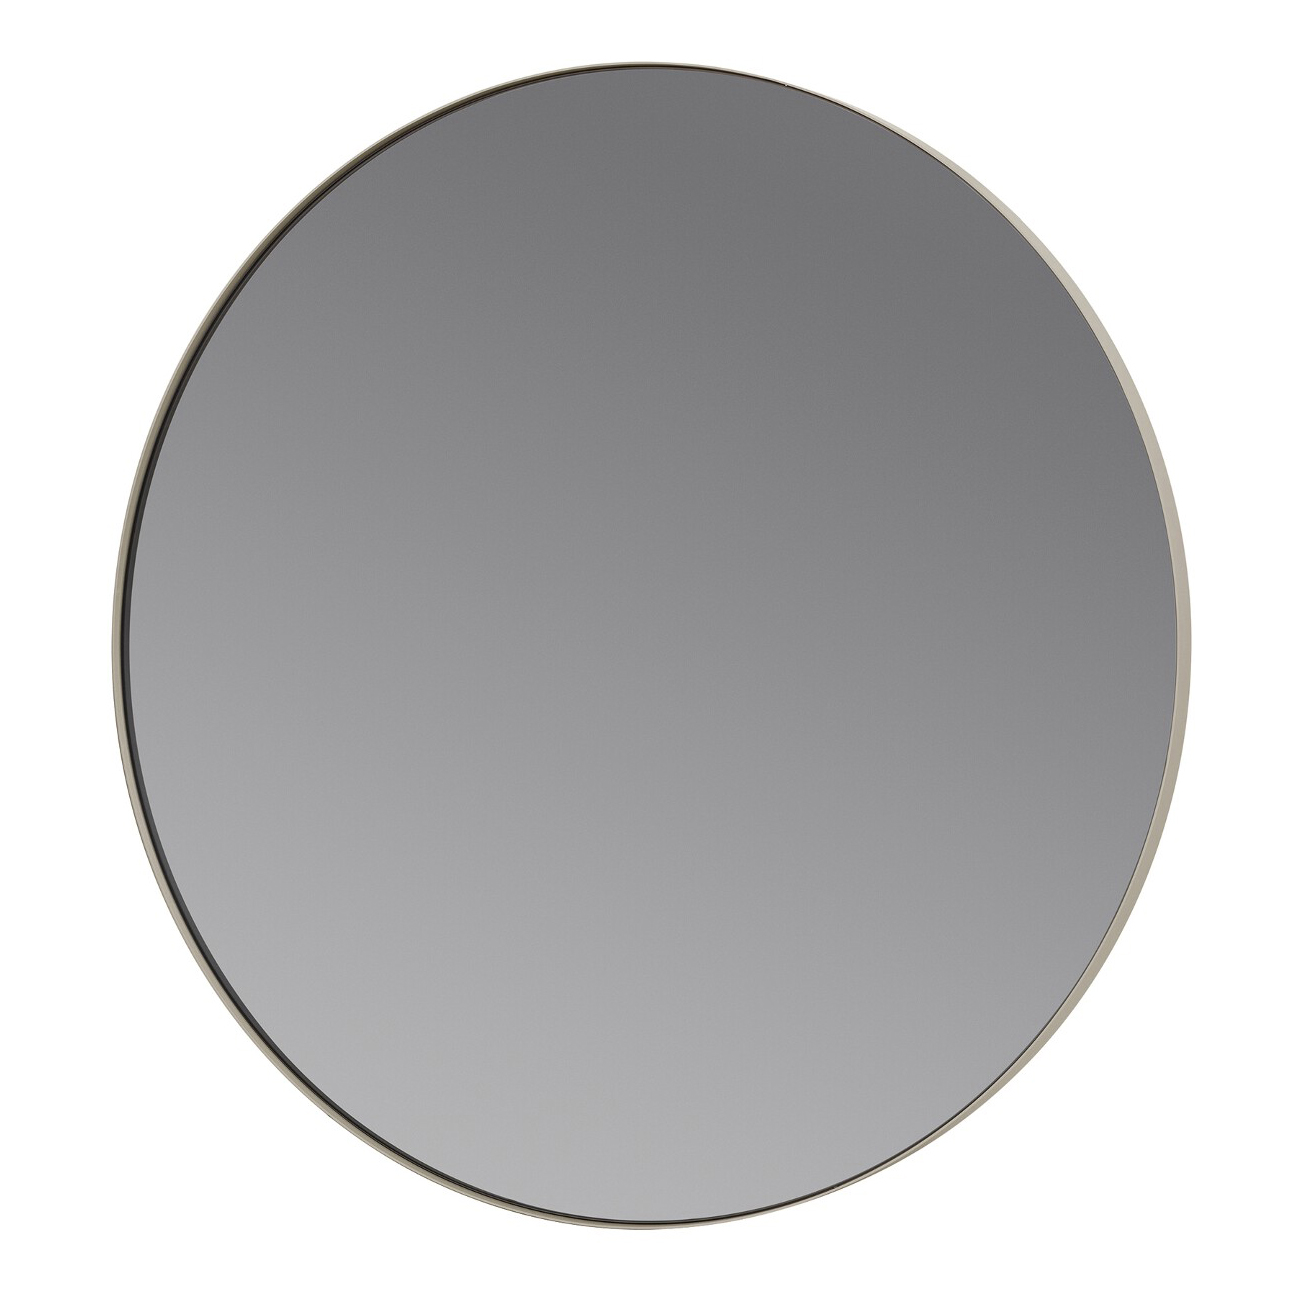 Okrúhle zrkadlo RIM sivé Blomus - Blomus RIM 80 cm šedohnedá